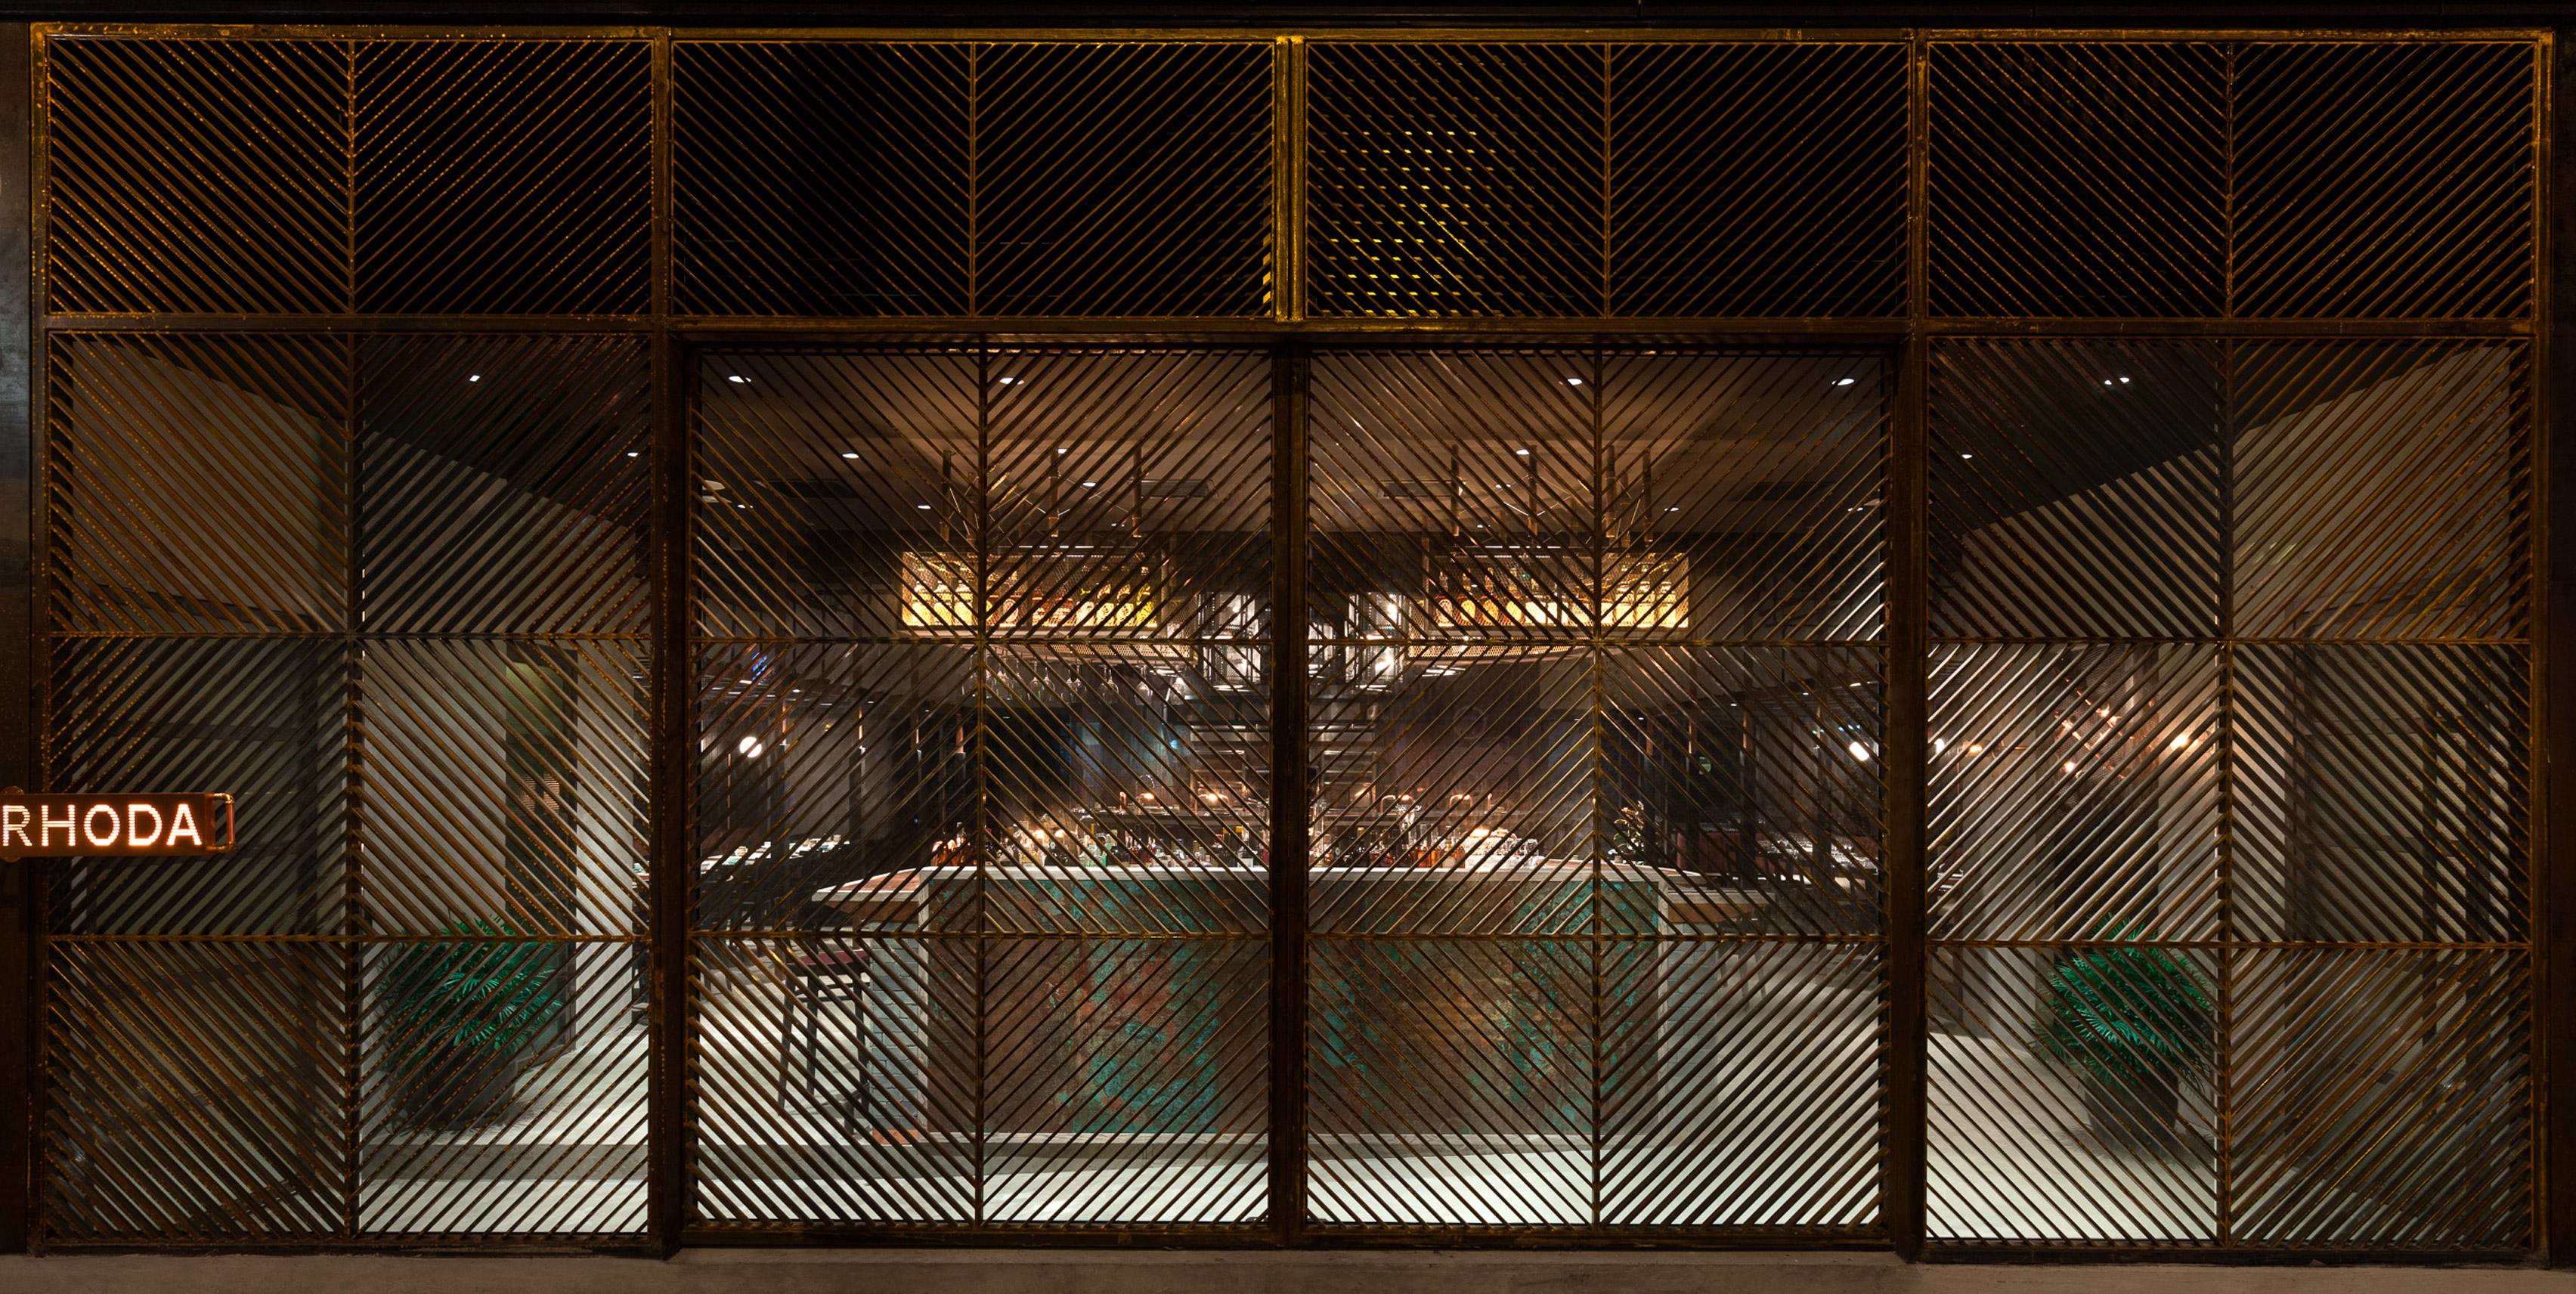 dennis-lo-rhoda-restaurant-joyce-wang-studio-hong-kong-interior-design_dezeen_3408_9